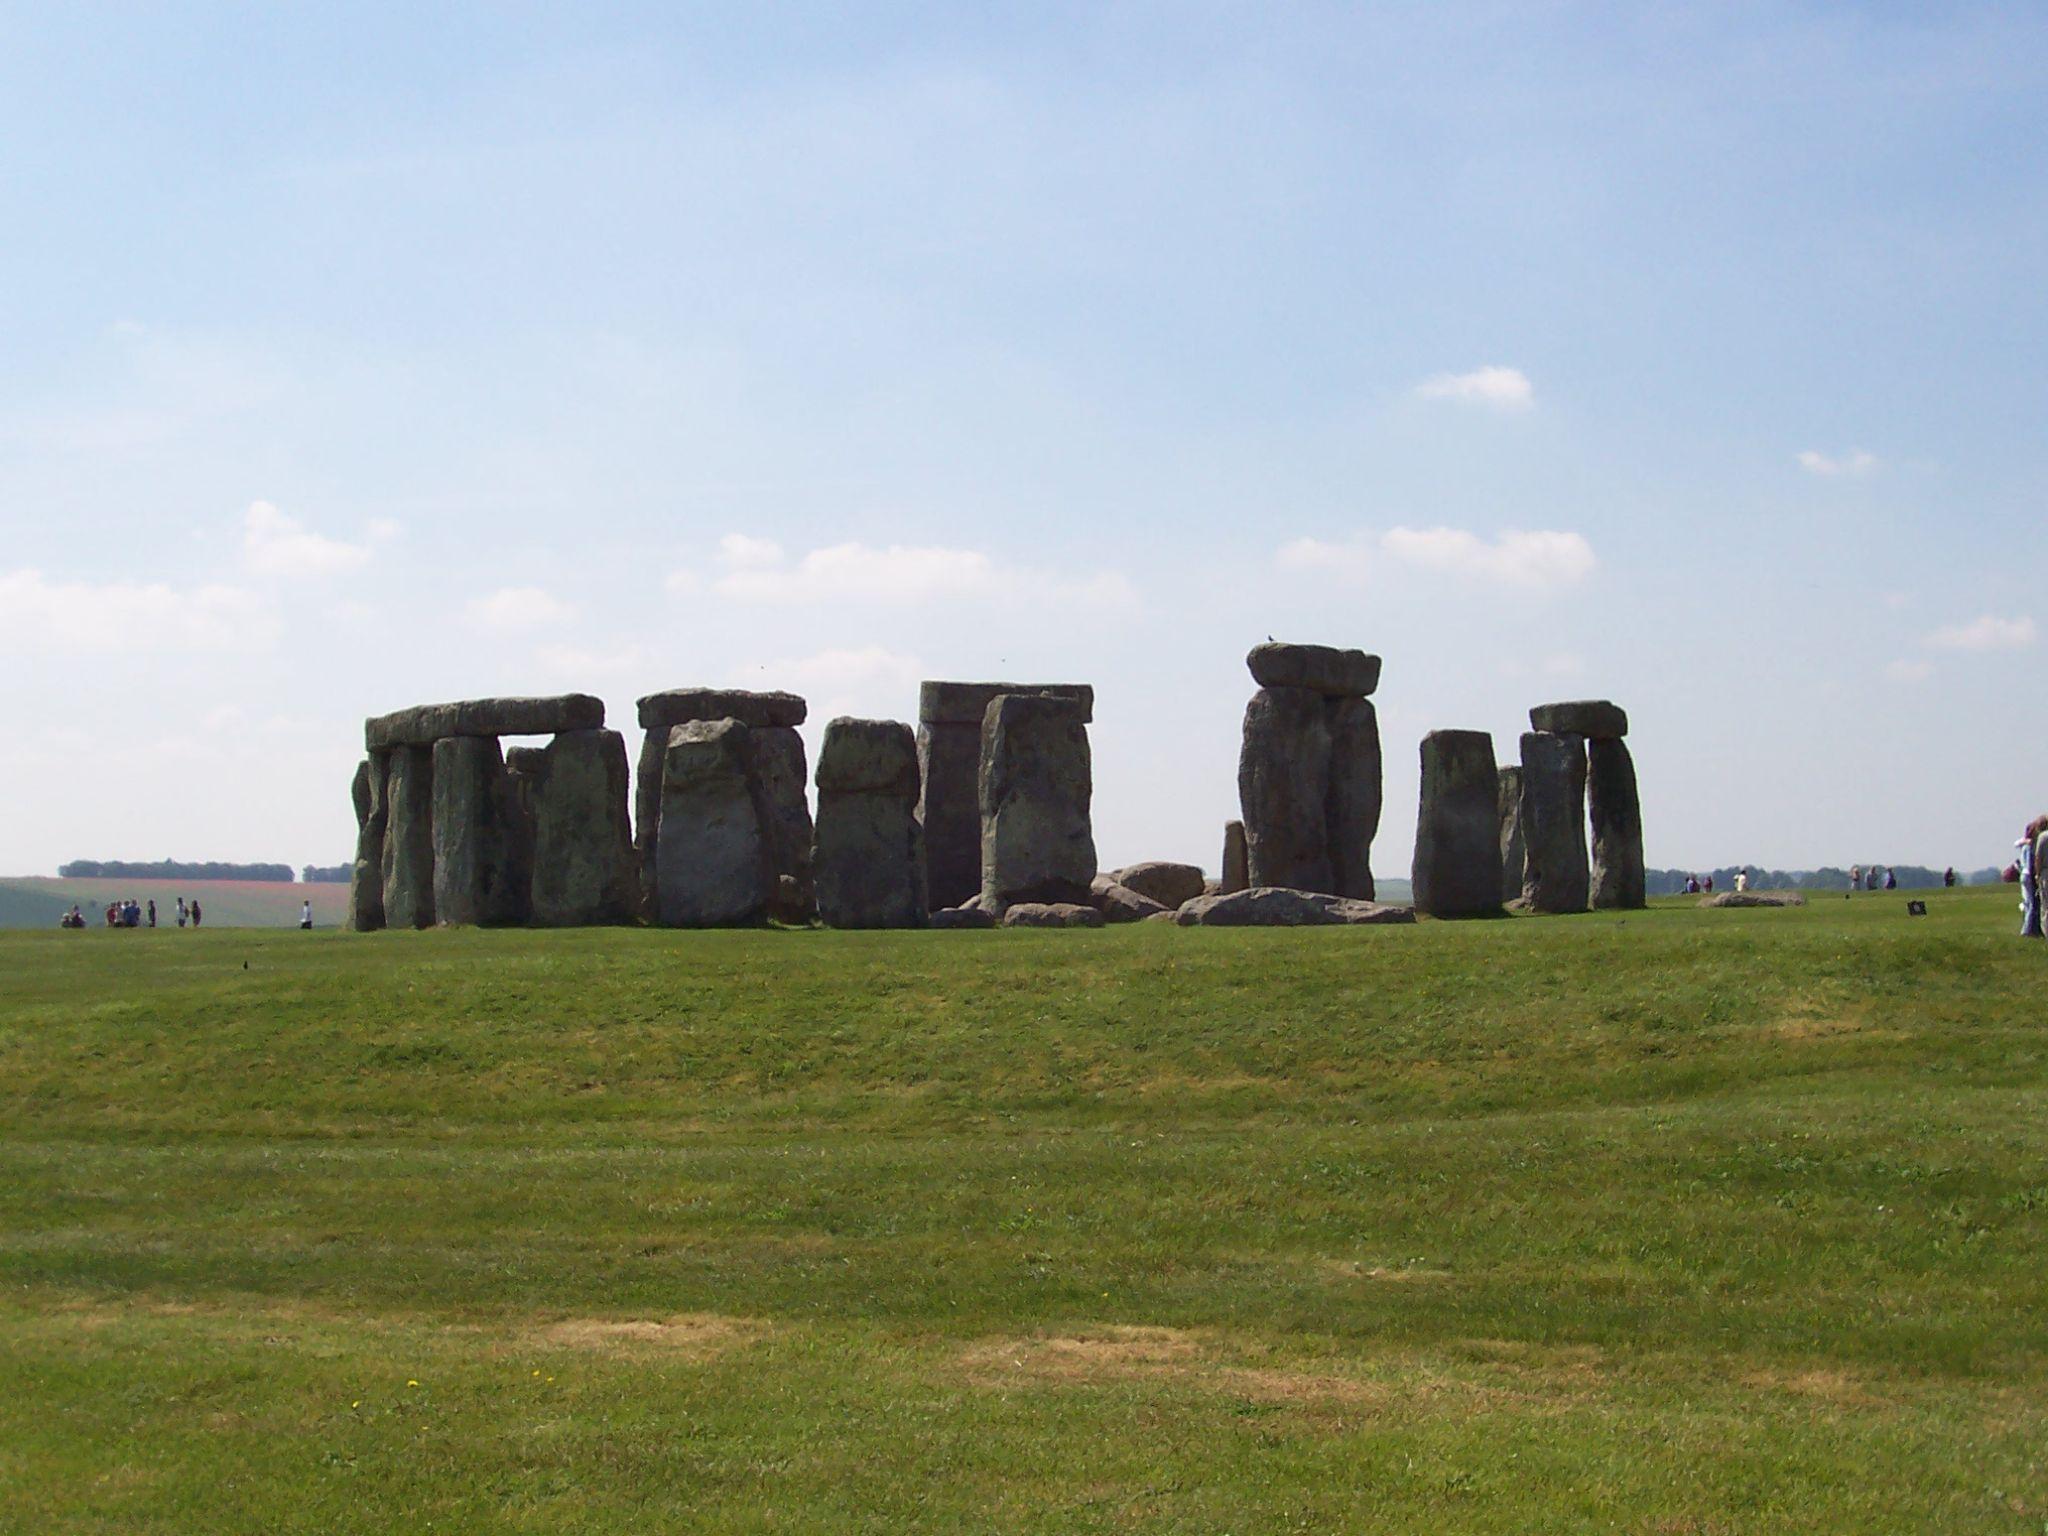 Stonehenge by Deena Roth